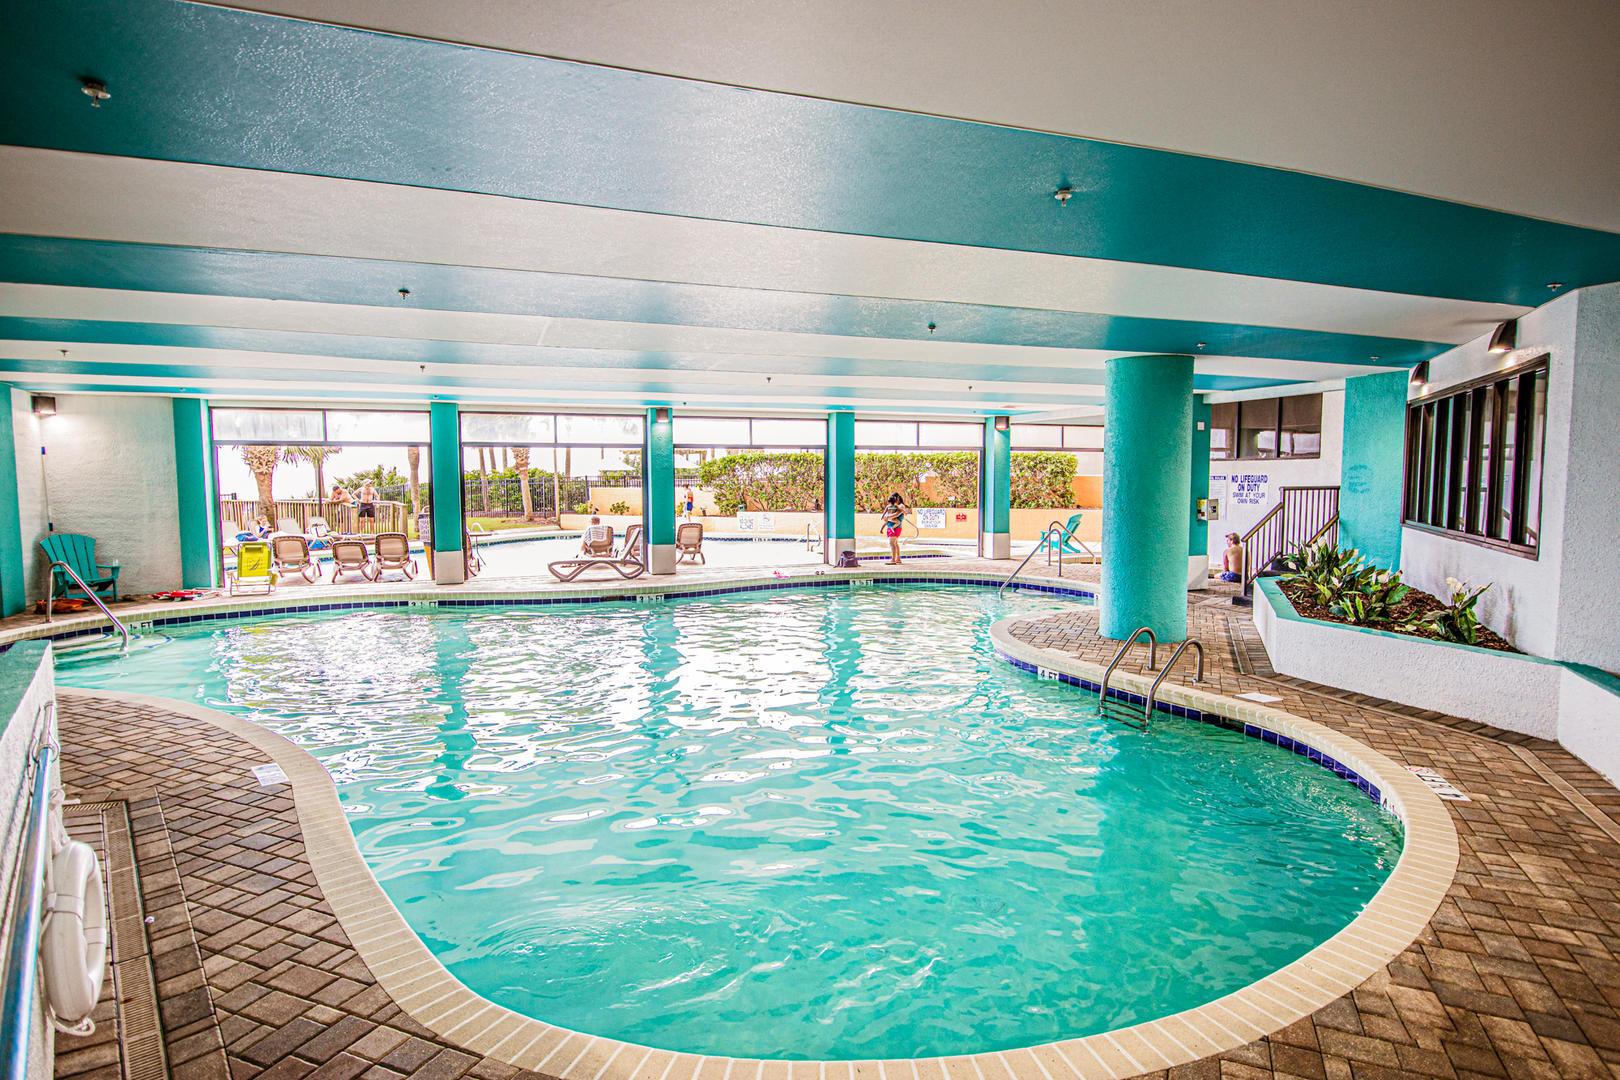 Patricia Grand Indoor Pool